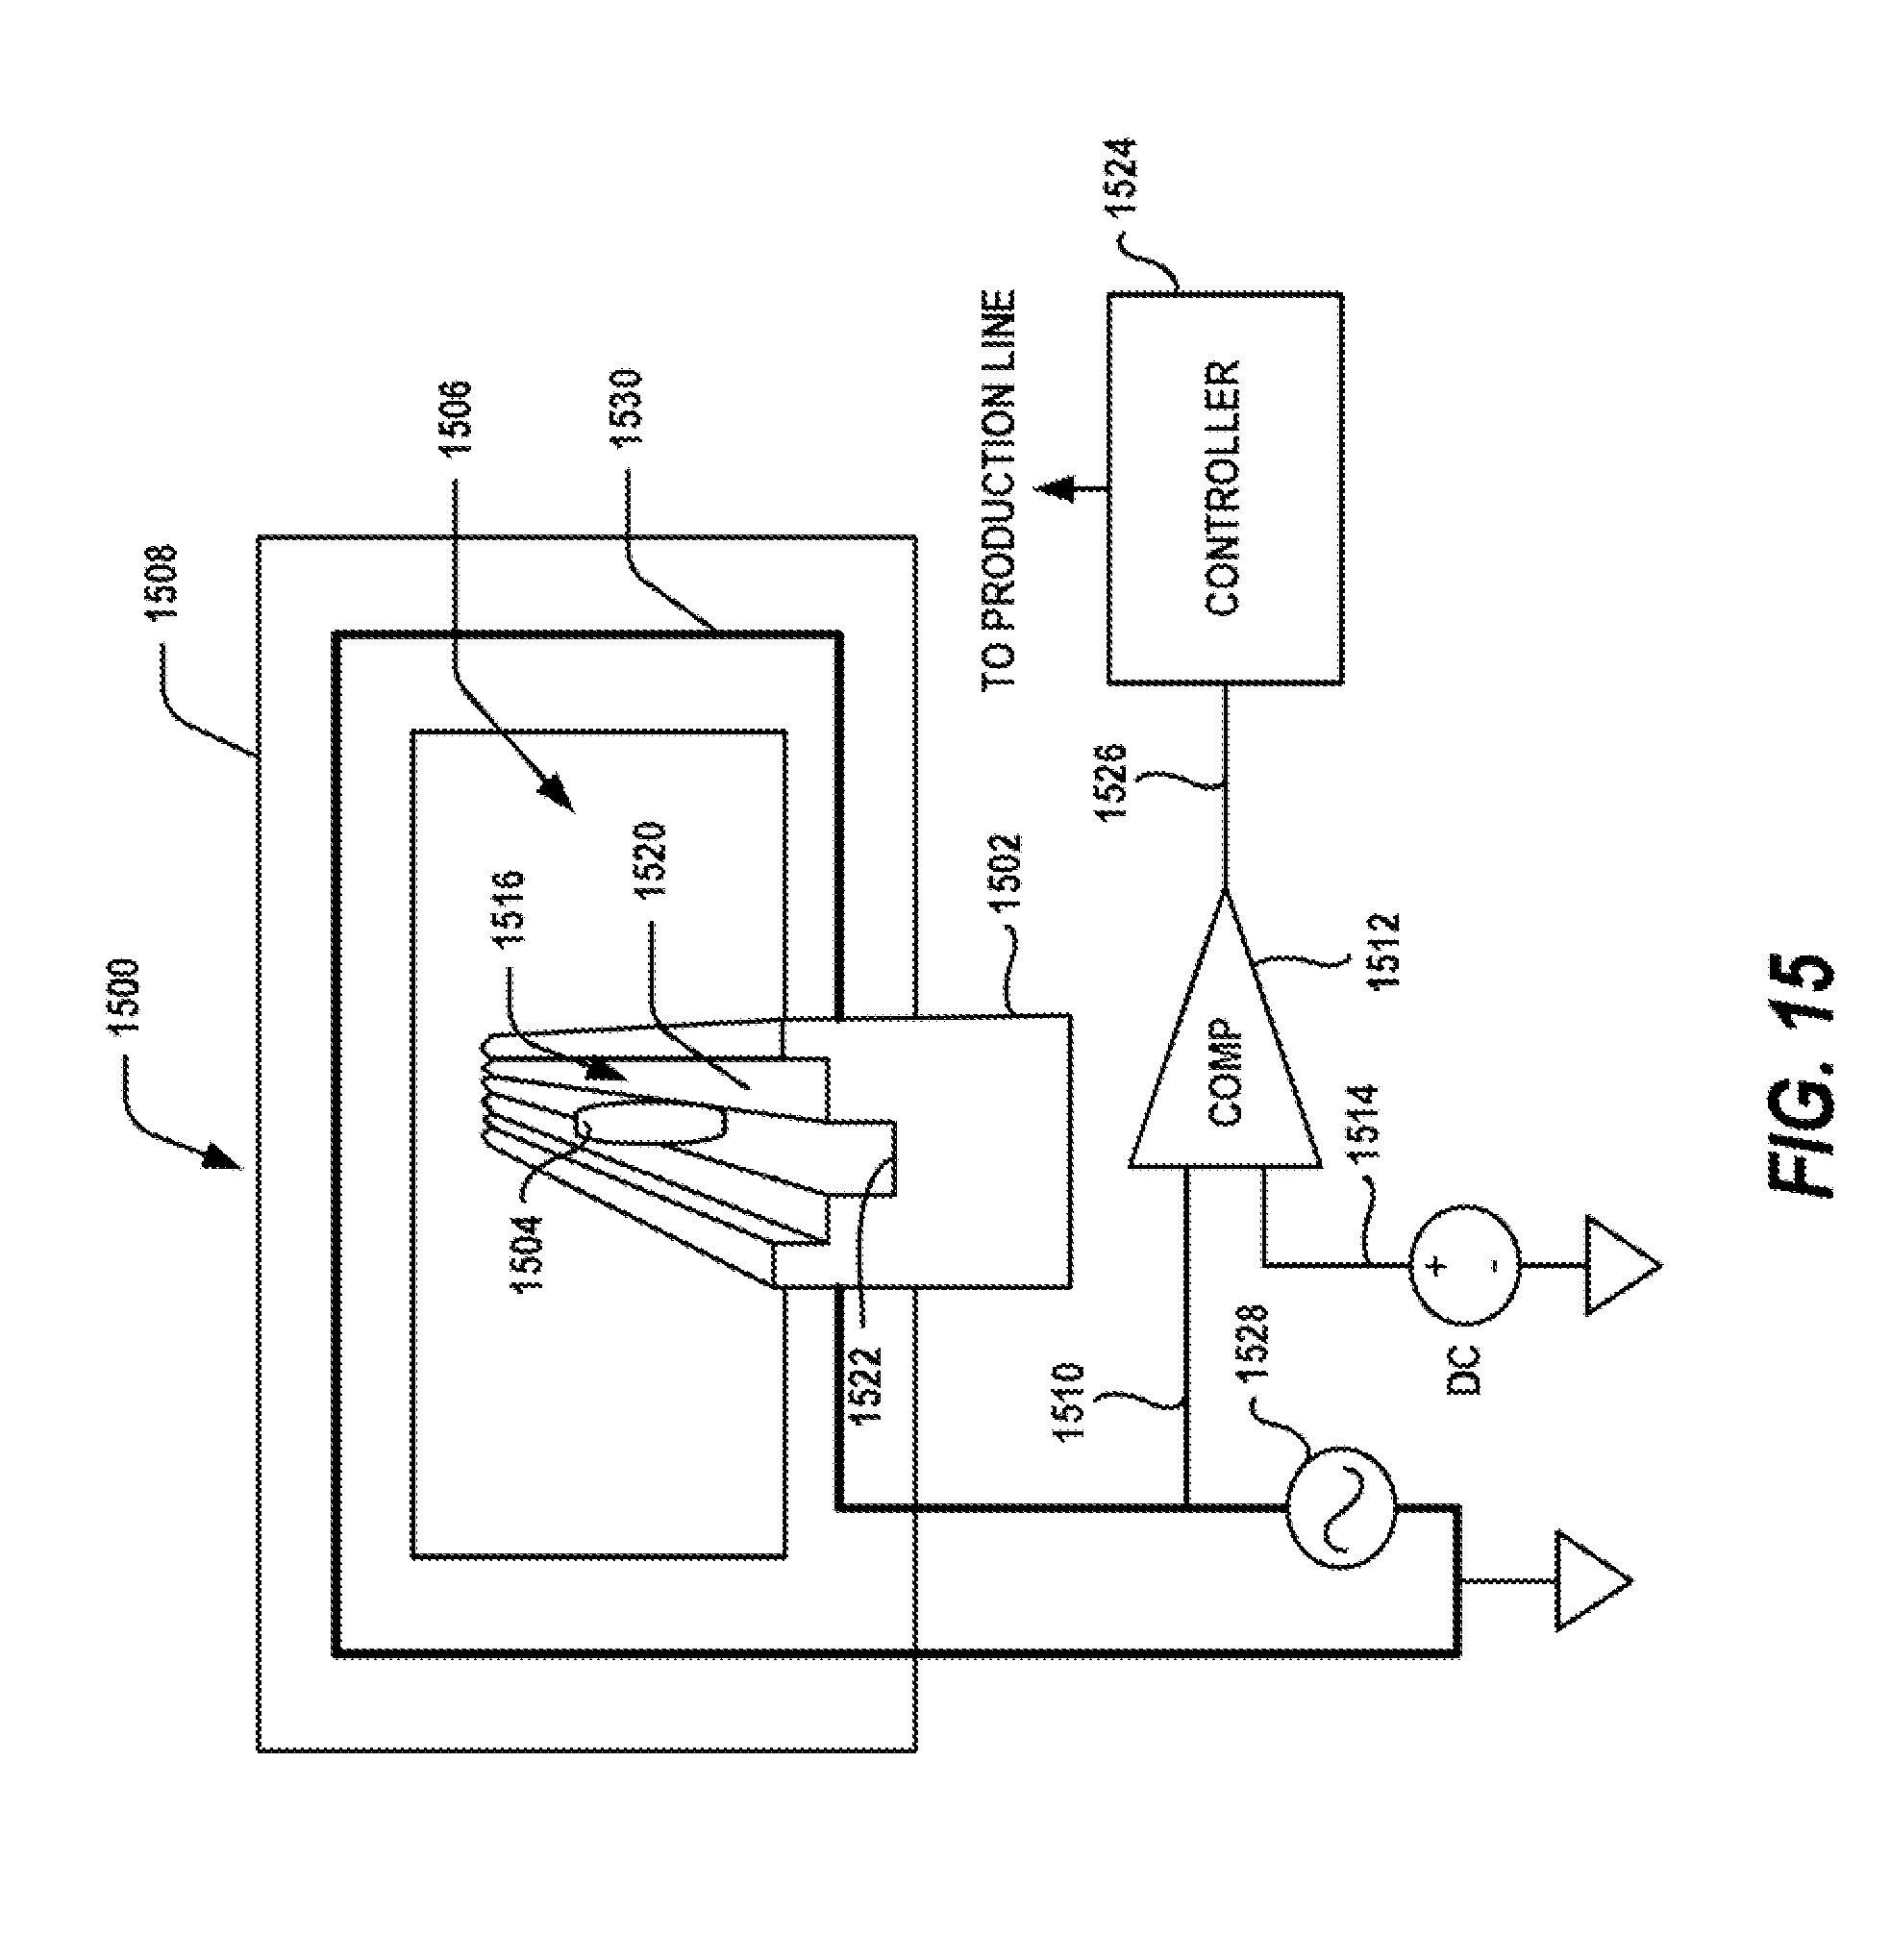 Patent US 10,175,376 B2 on